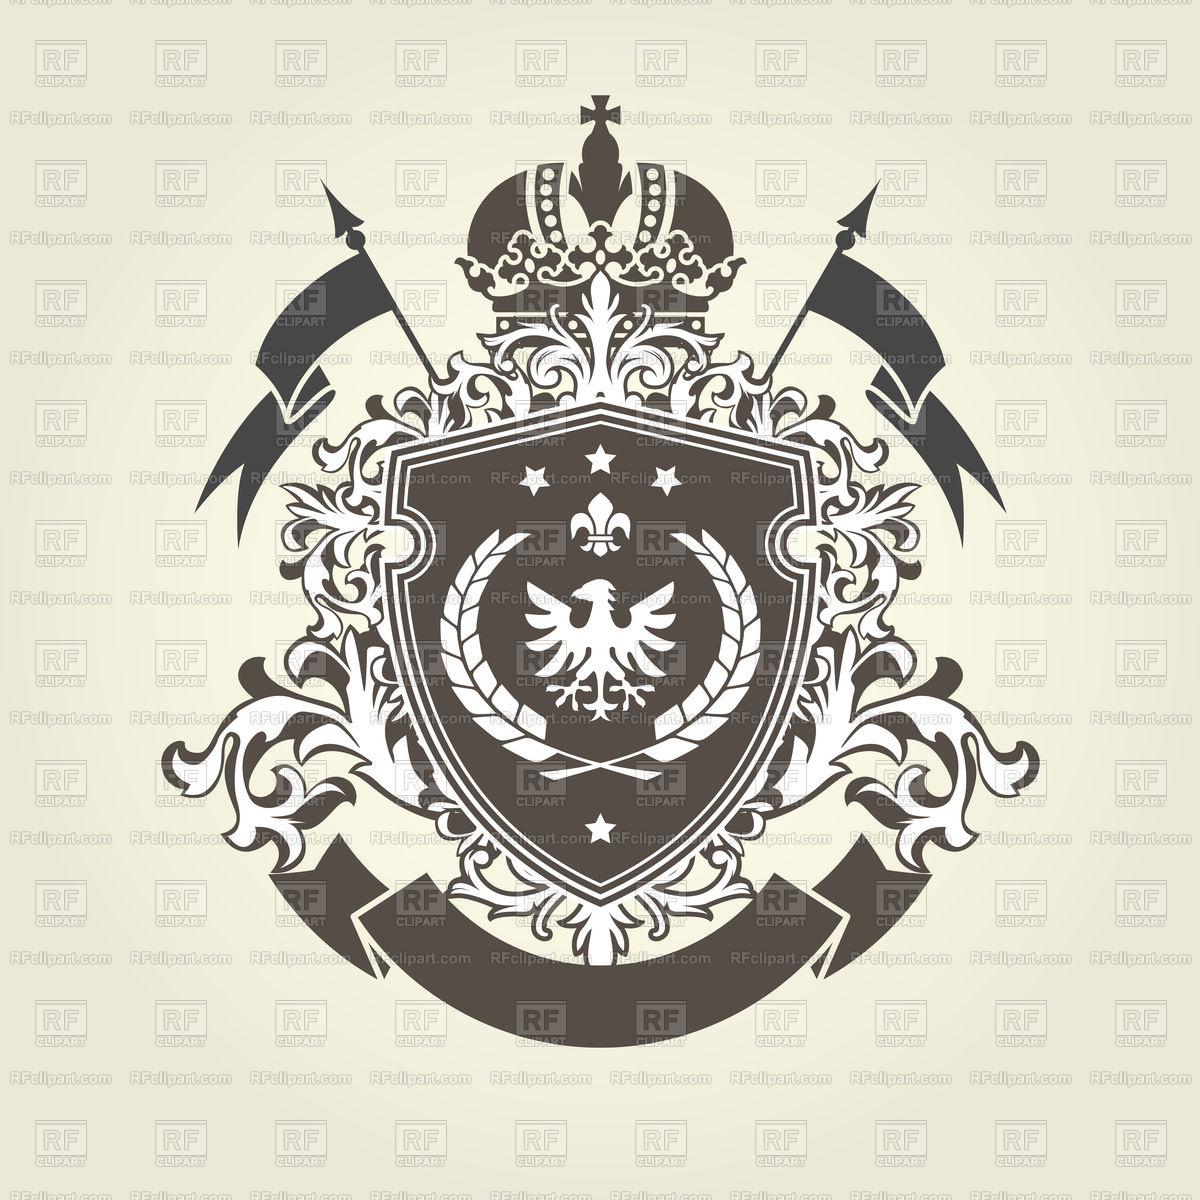 1200x1200 Royal Coat Of Arms